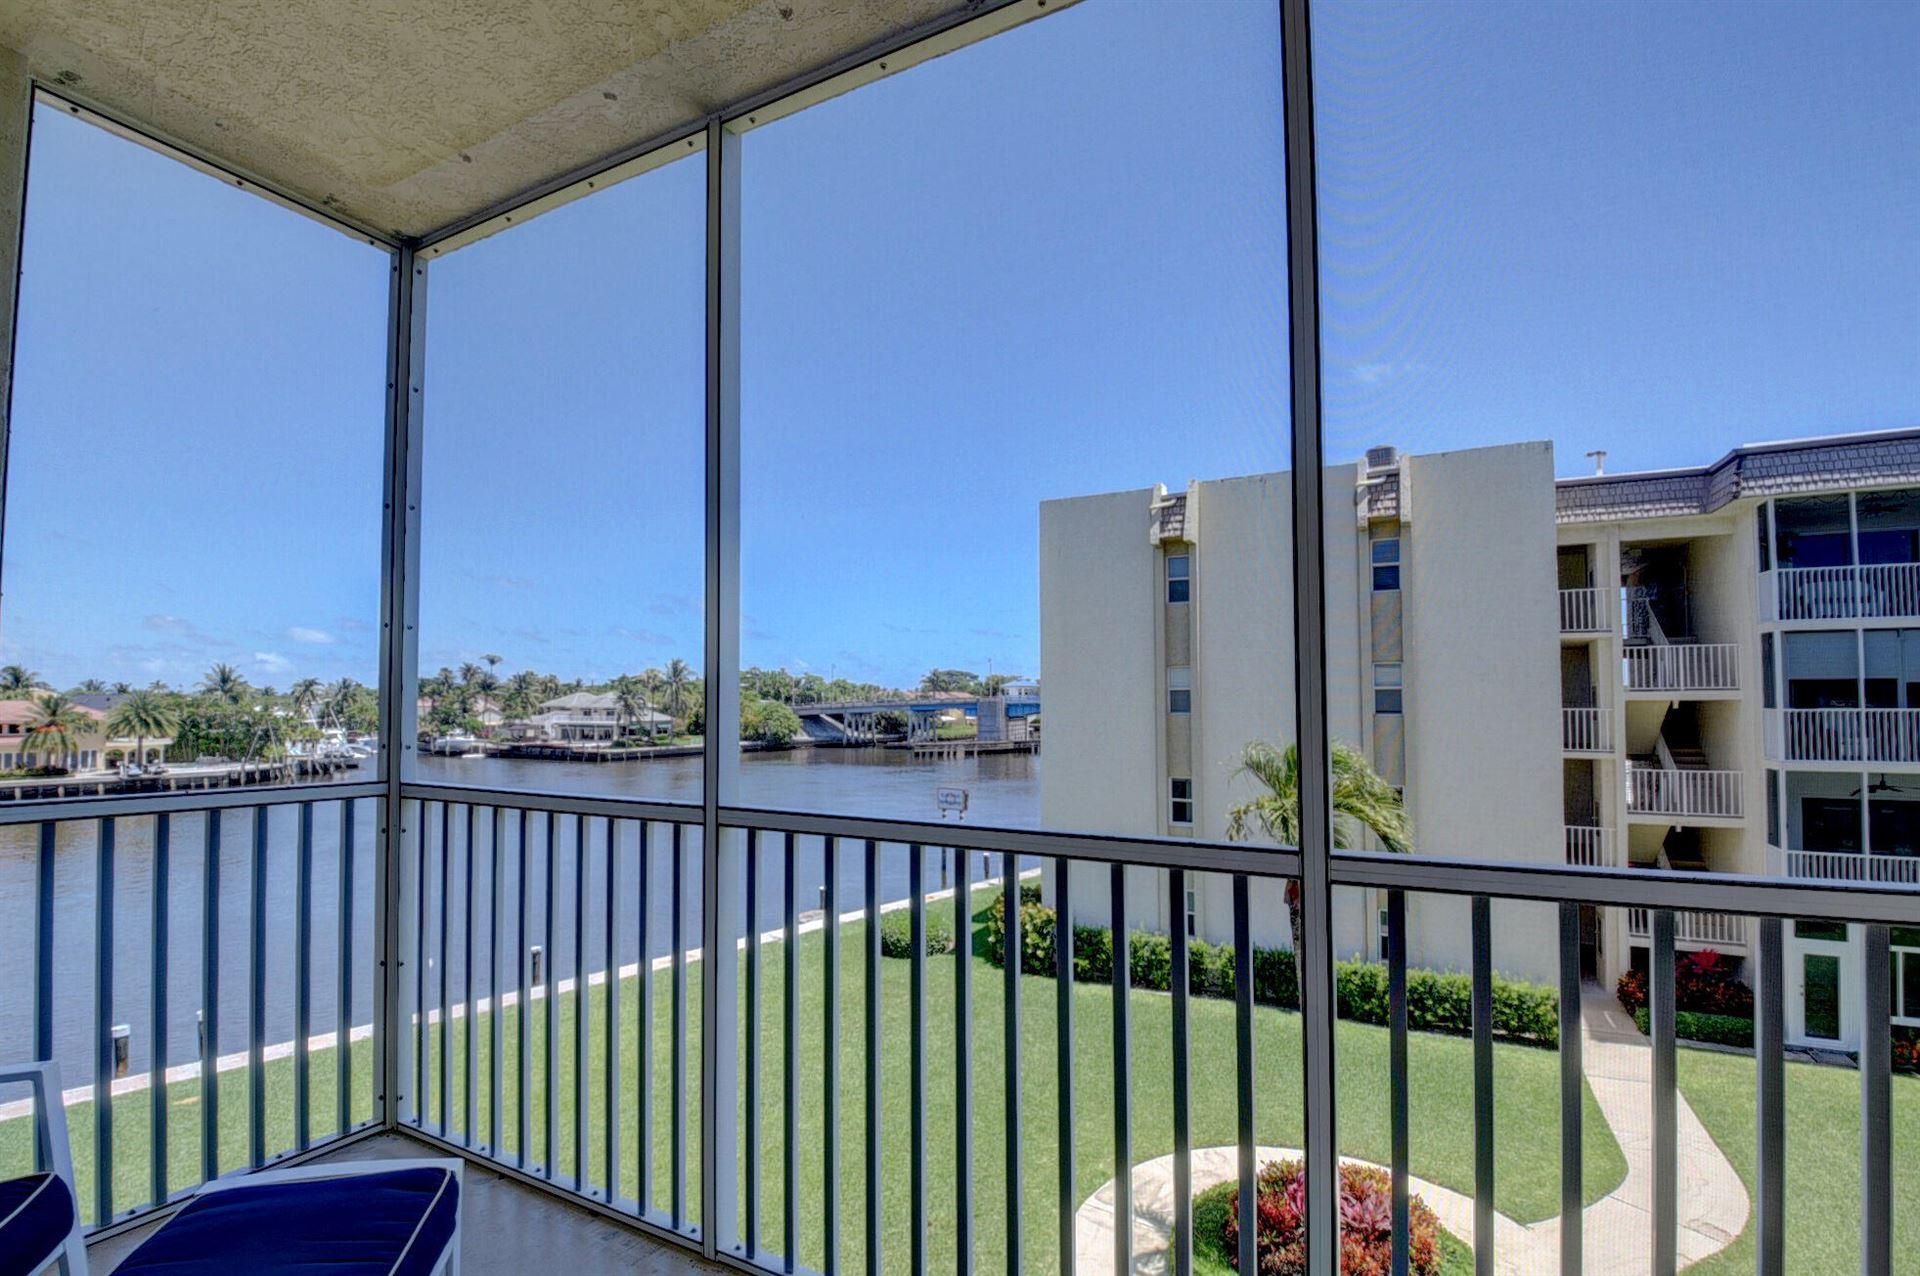 650 Snug Harbor Drive #G 304, Boynton Beach, FL 33435 - #: RX-10723629